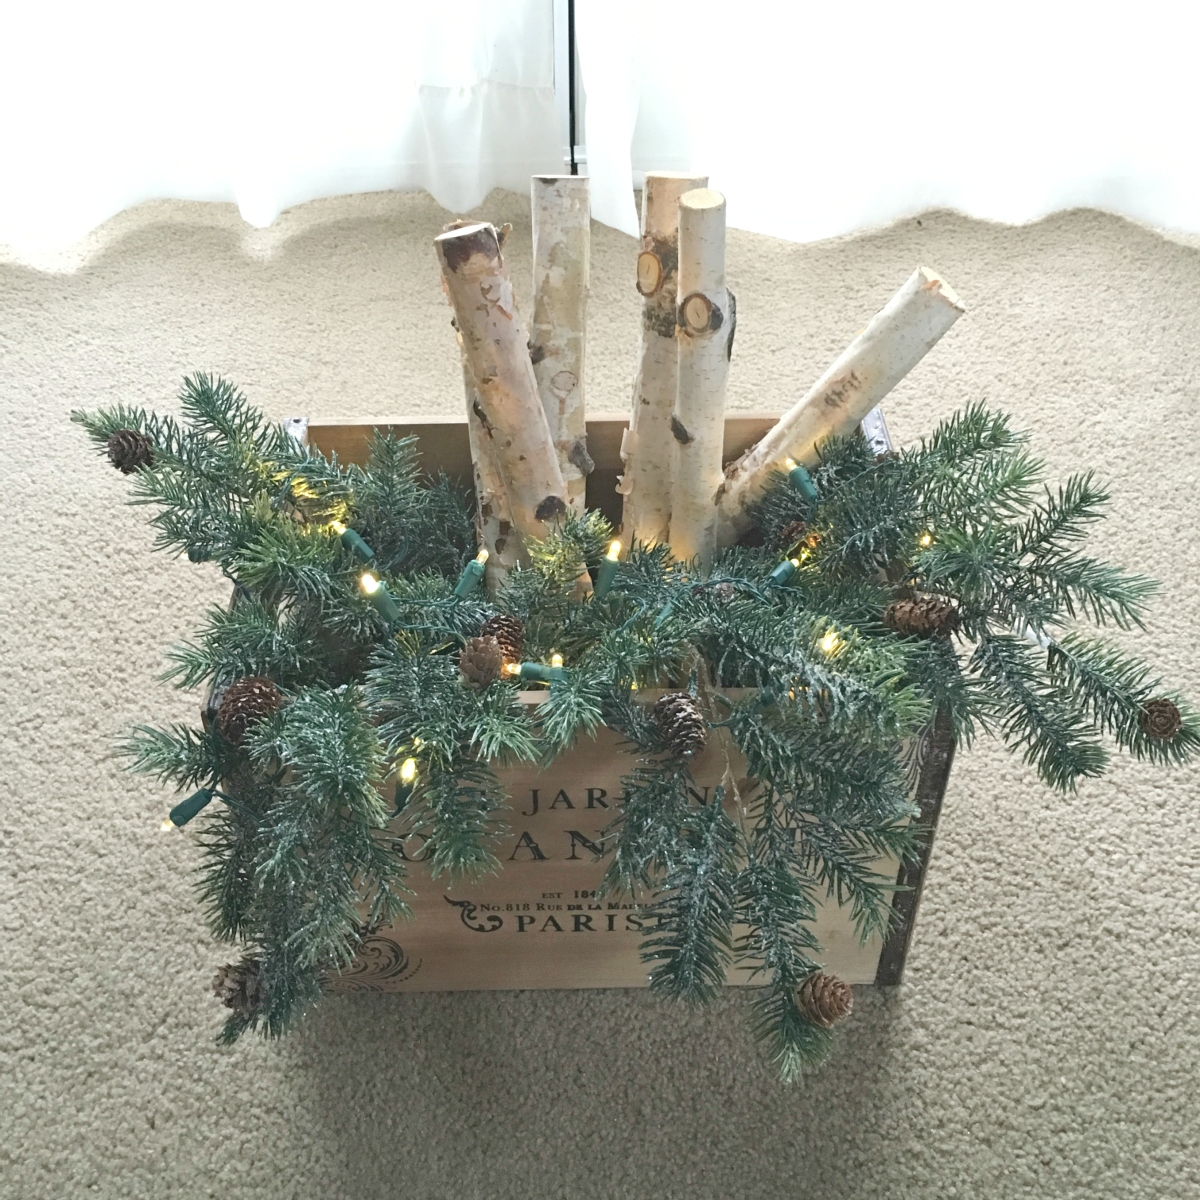 Lighted Birch Holiday Boxes: so easy! |www.pearlsandsportsbras.com|